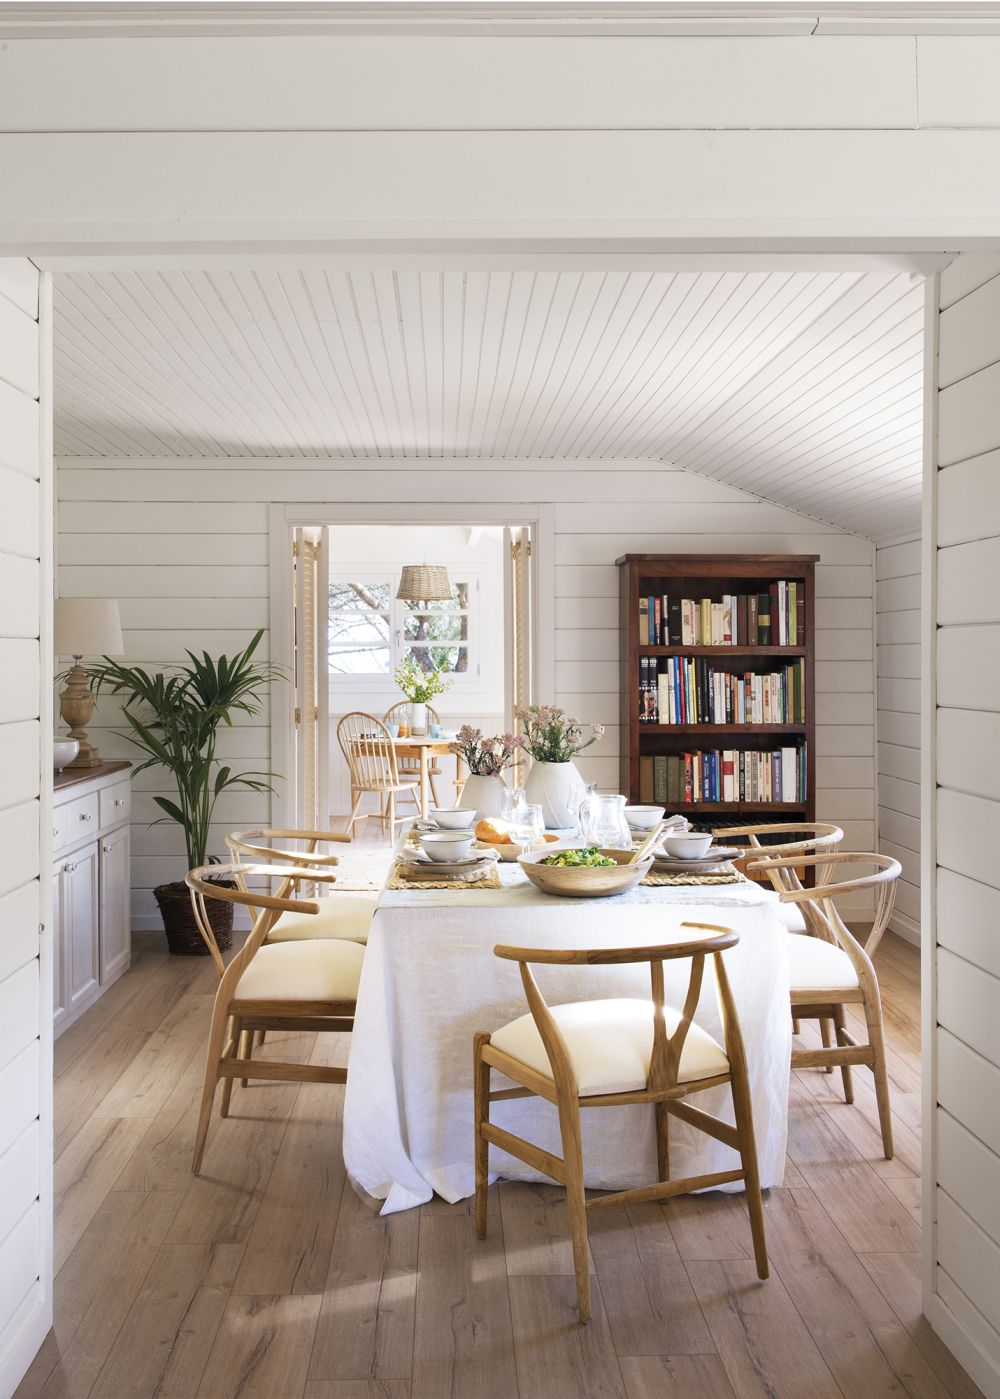 adelaparvu.com despre casa de vacanta devenita casa permanenta, casa Spania, designer Marta Prats, Foto Stella Rotger(2)